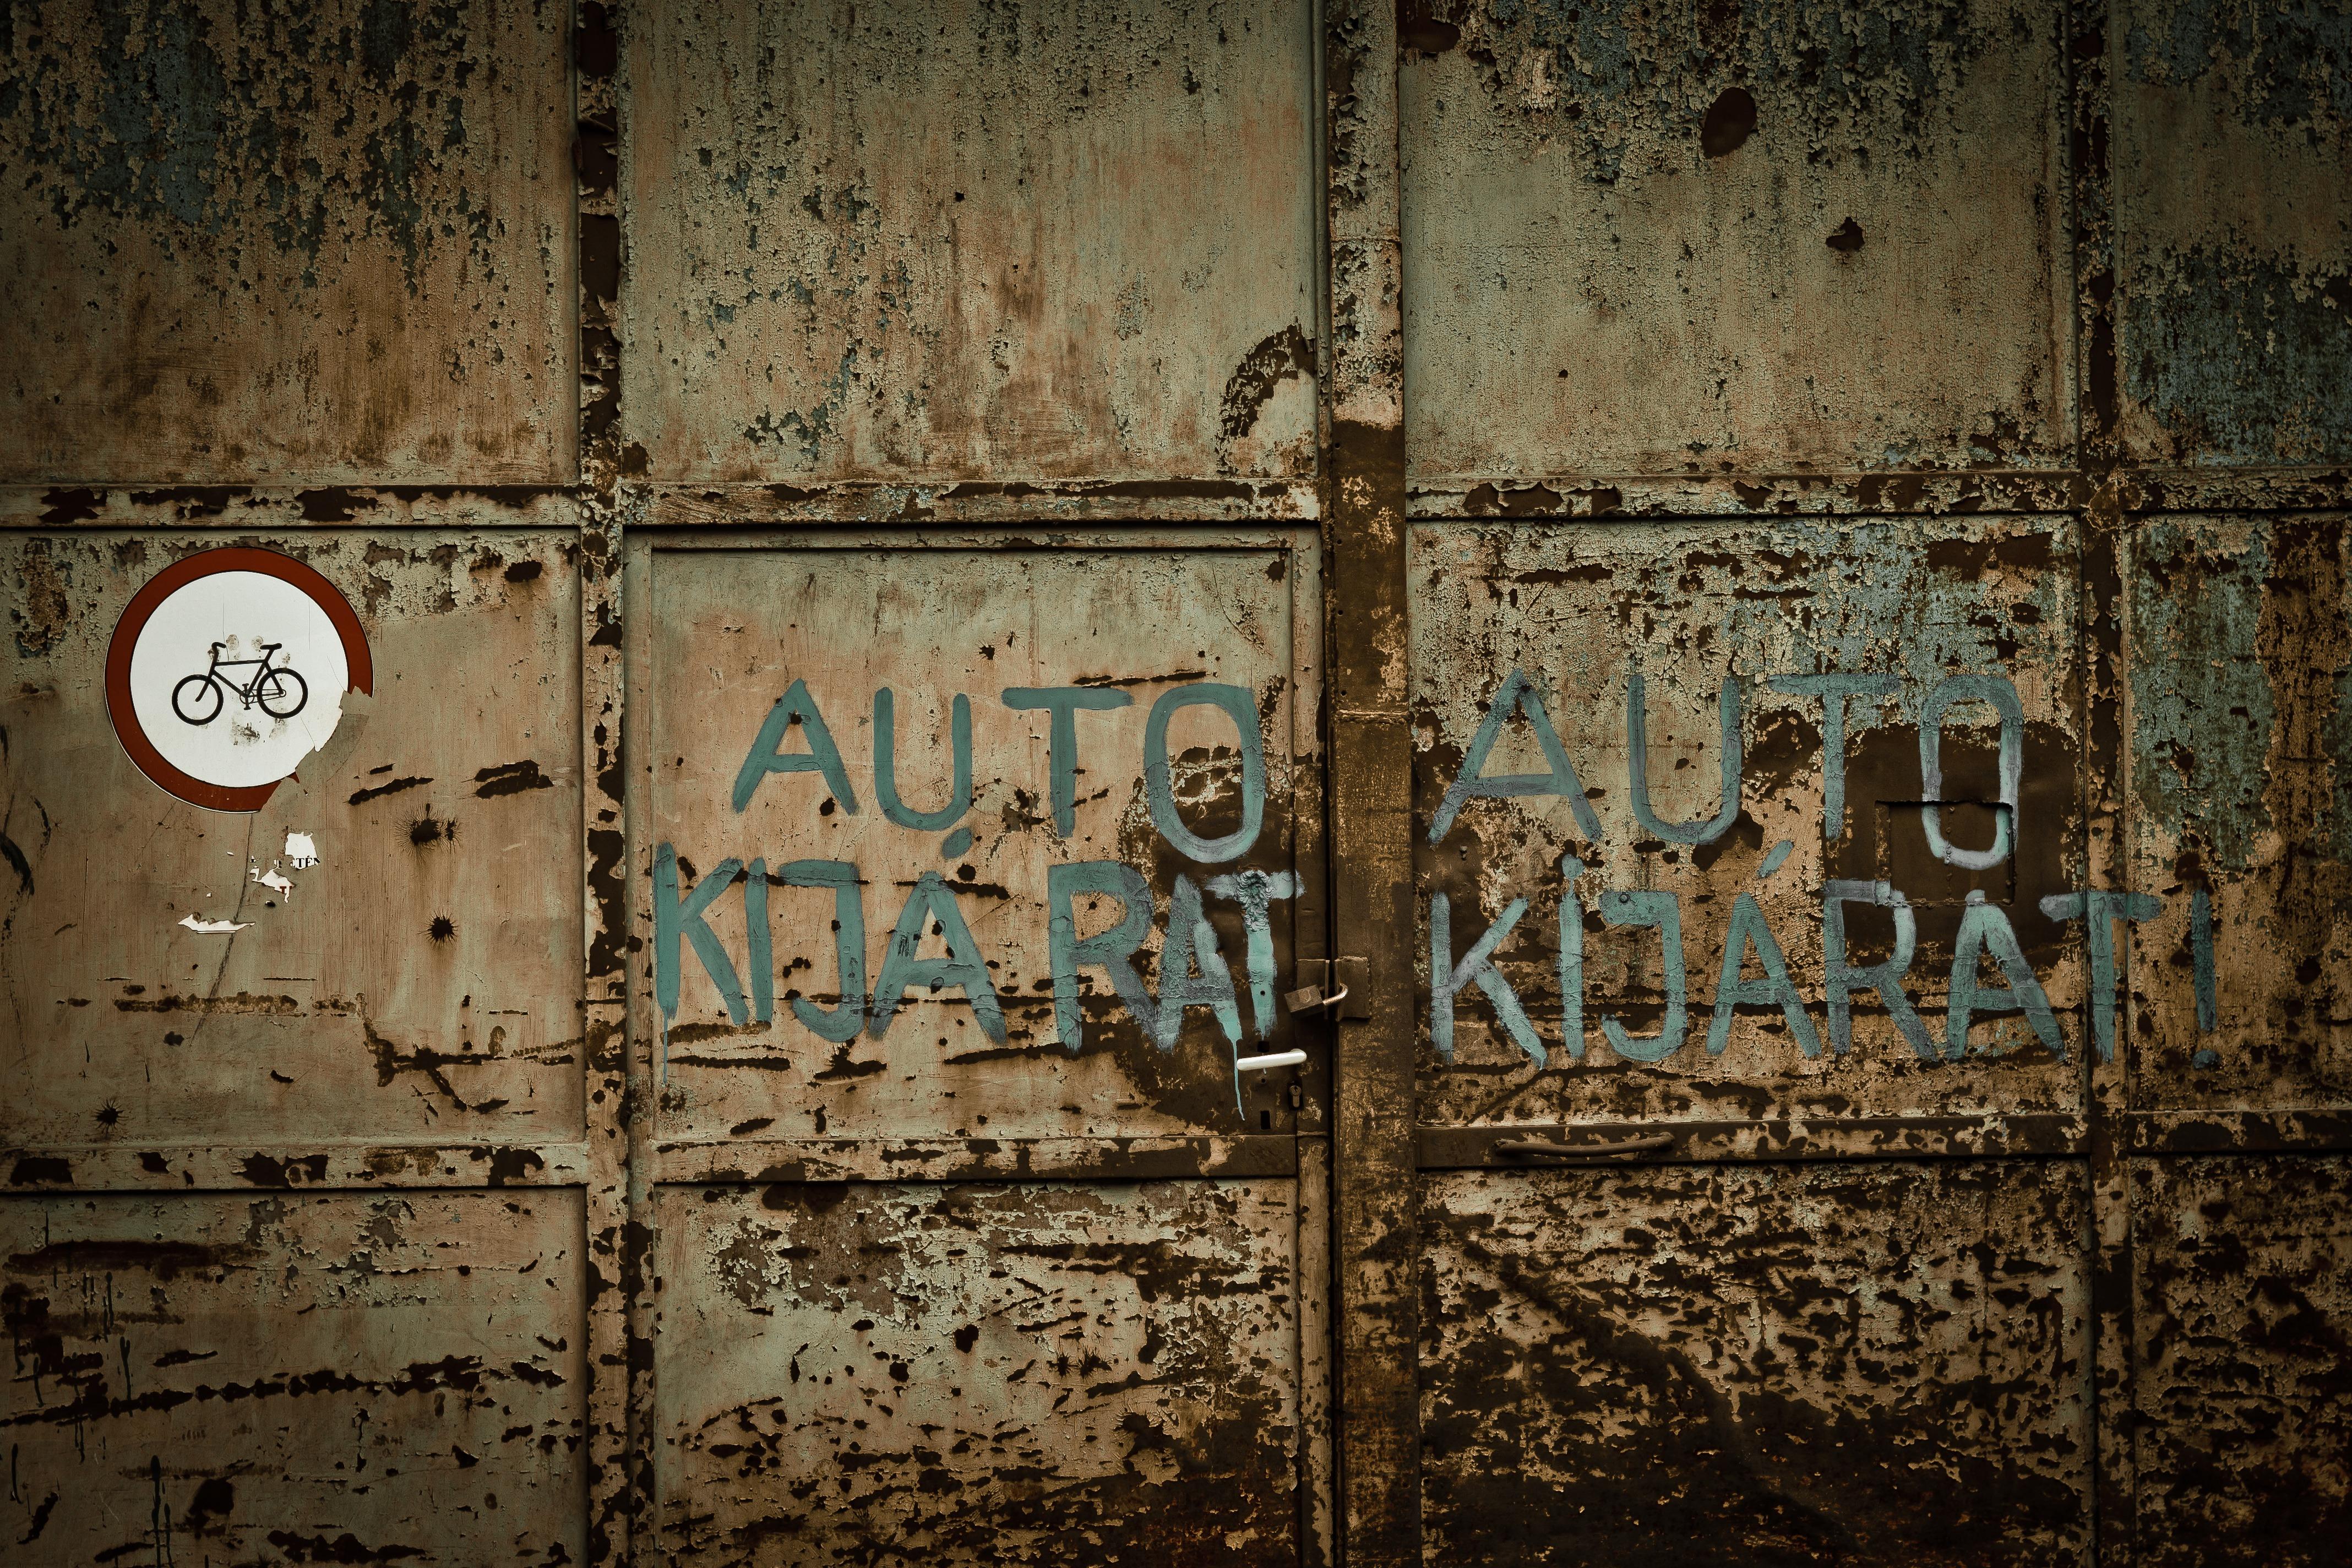 modern door texture. Wood Texture Old Wall Rust Exit Color Garage Graffiti Door Painting Art Budapest Iron Modern